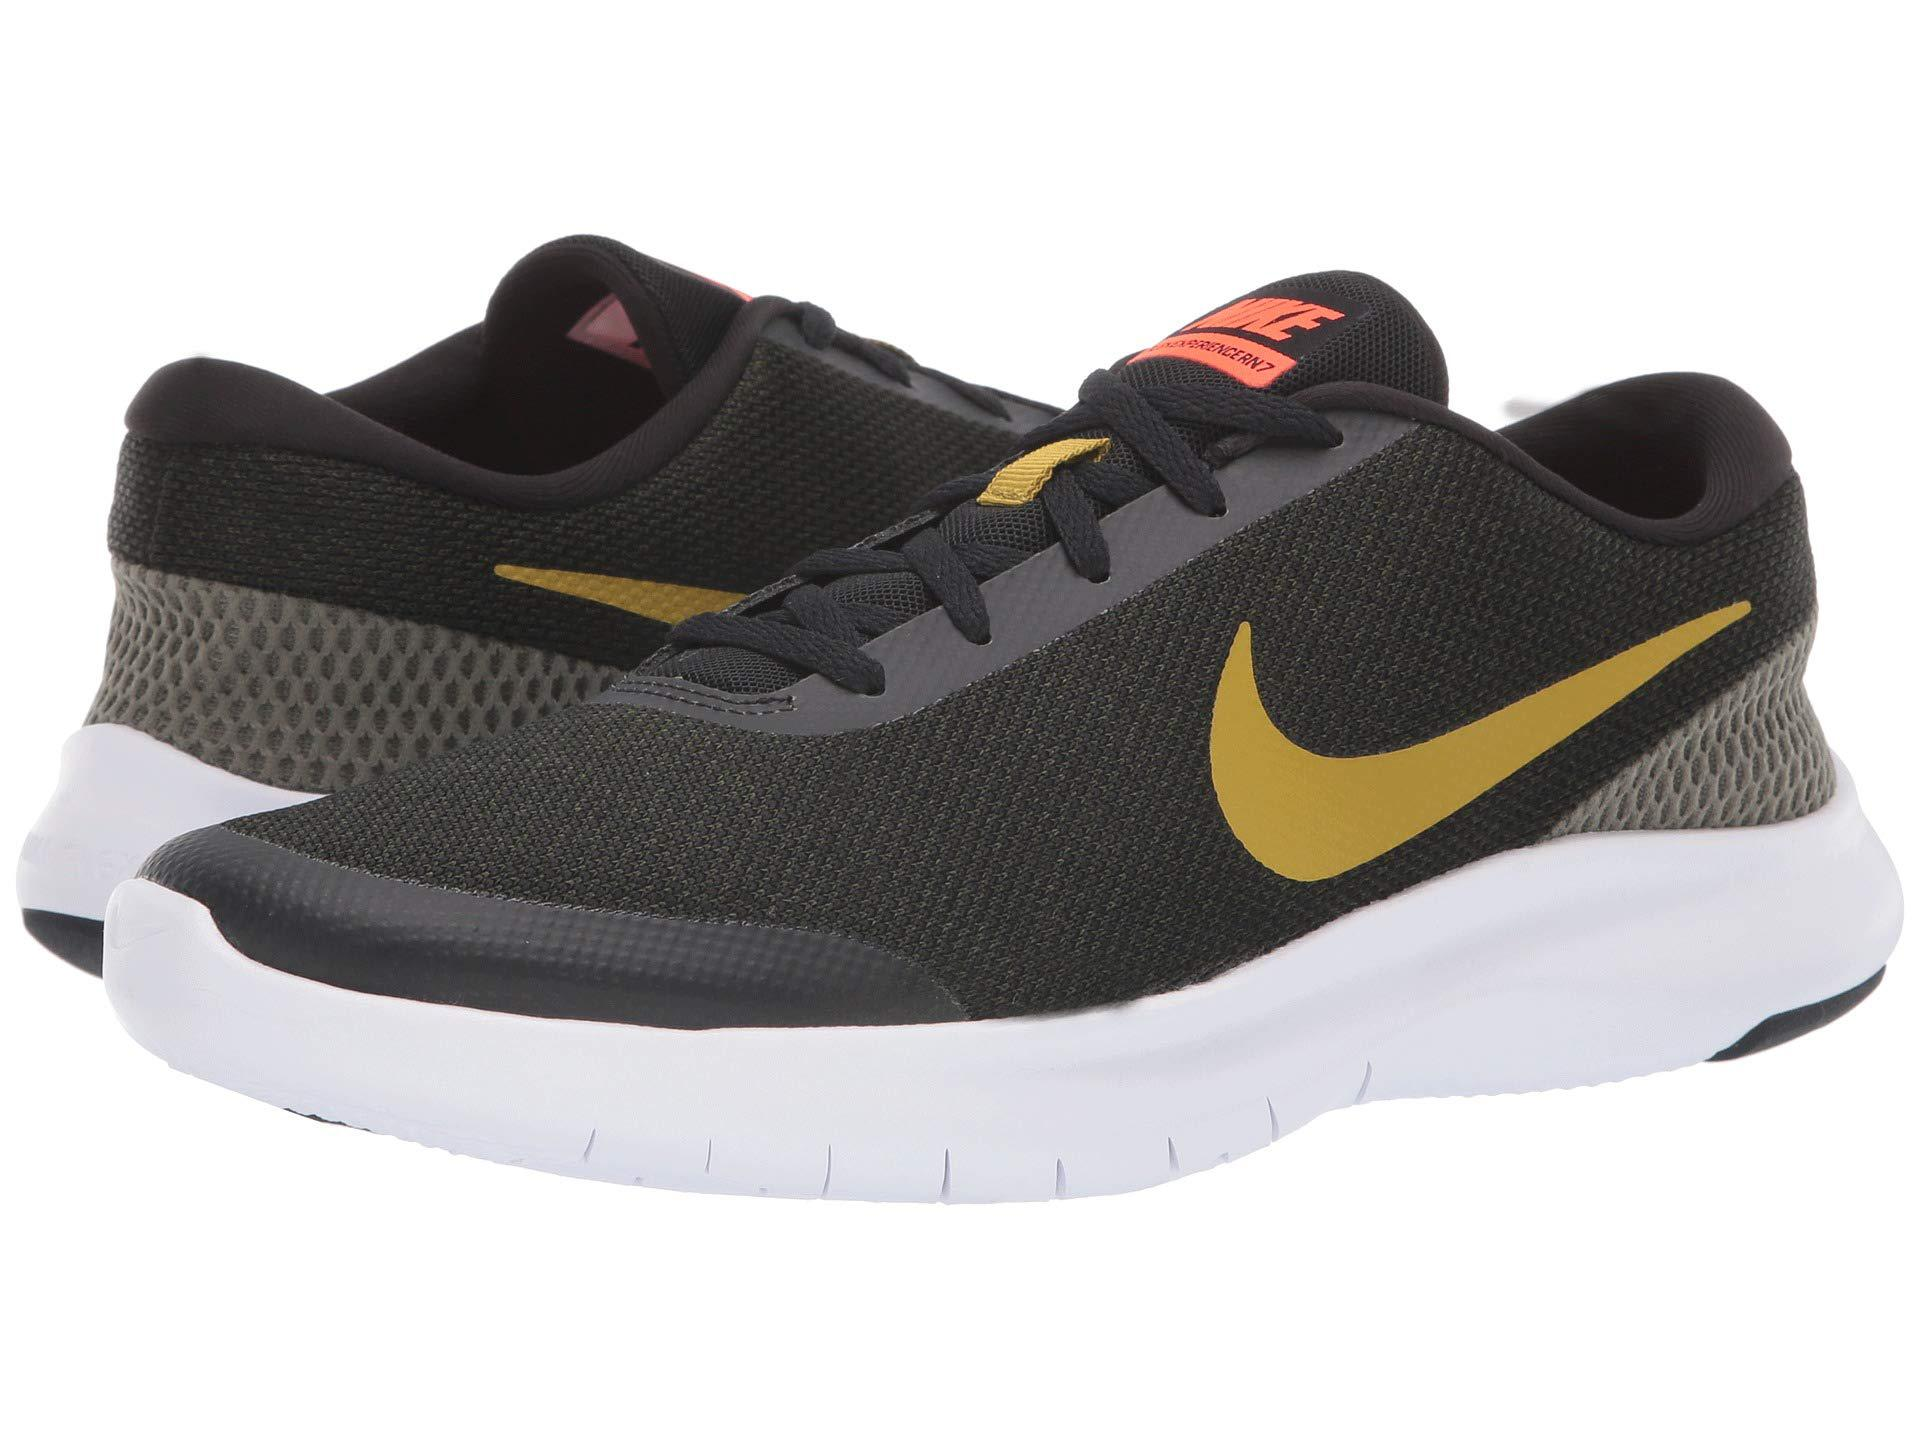 3e0cd1861835 Lyst - Nike Flex Experience Rn 7 (black peat Moss medium Olive ...